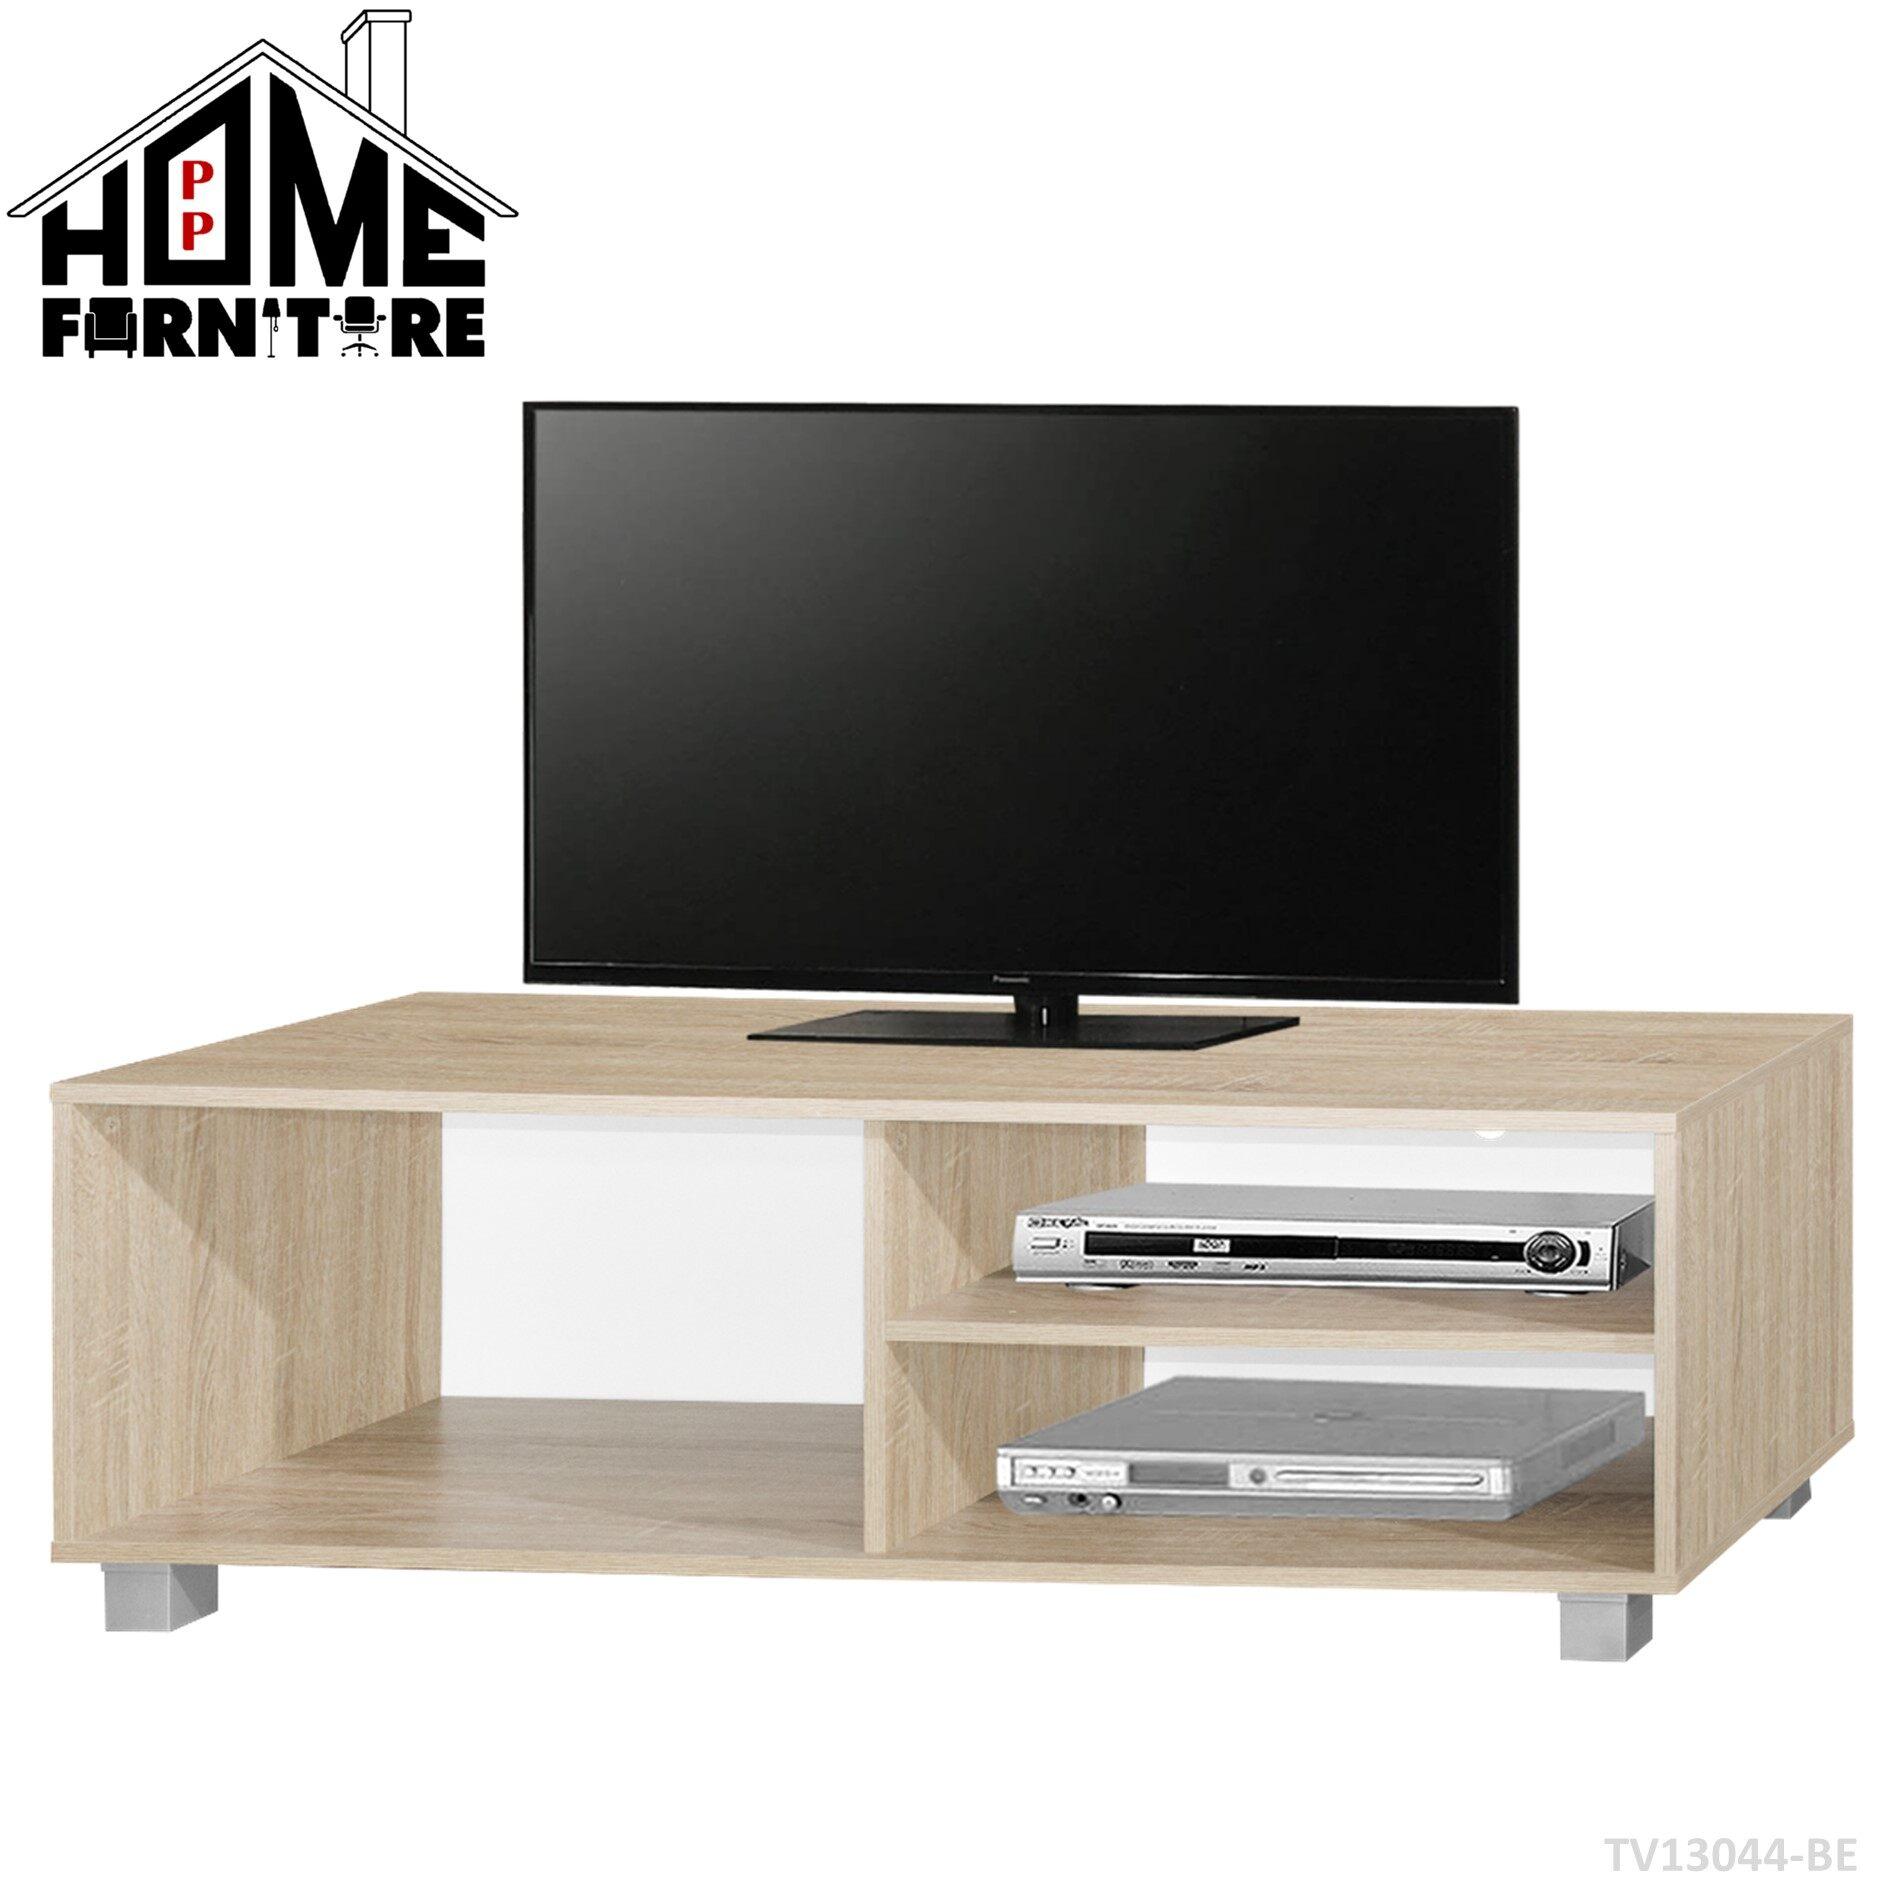 PP HOME TV cabinet modern set/Television cabinet/TV console/TV rack/TV table media storage/TV storage organizer/ Almari TV/Kabinet TV/Rak TV/Meja TV 电视柜/电视橱/电视桌TV13044-BE